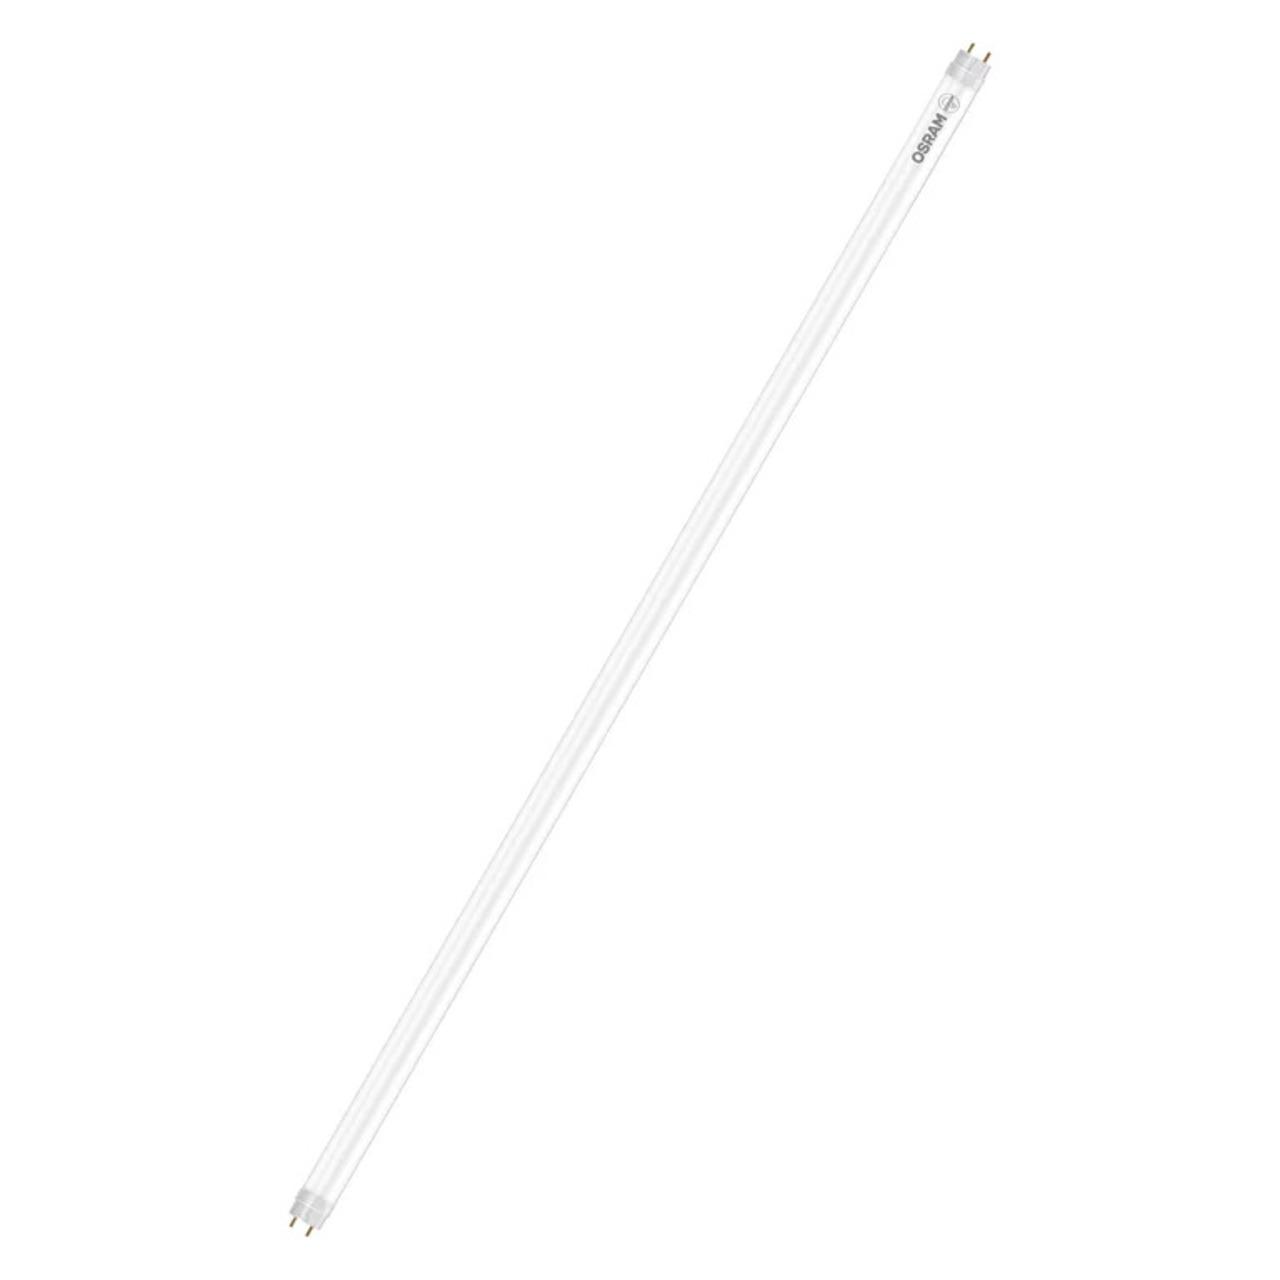 OSRAM SubstiTUBE Star 19-1-W-T8-LED-Röhrenlampe 150 cm- kaltweiss